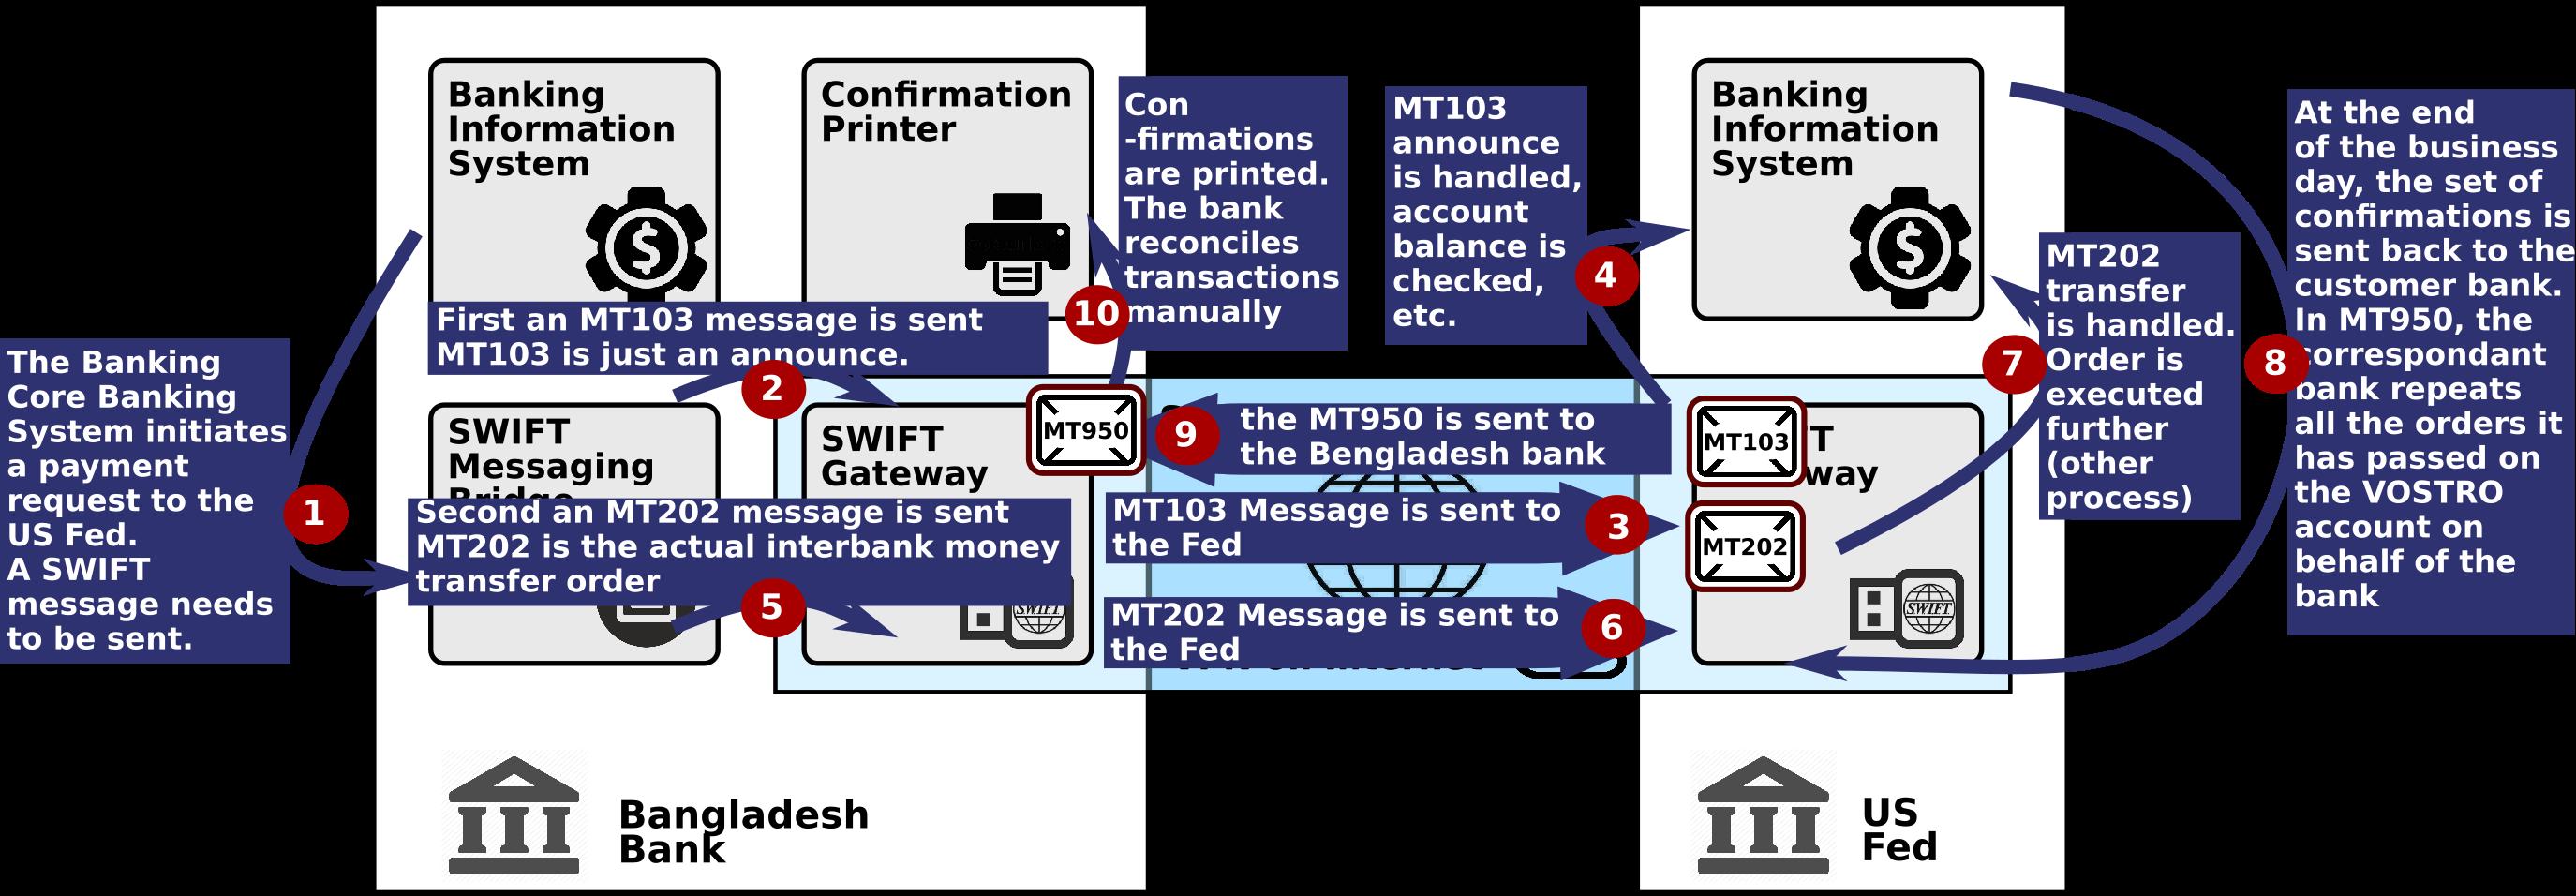 td bank international wire transfer instructions